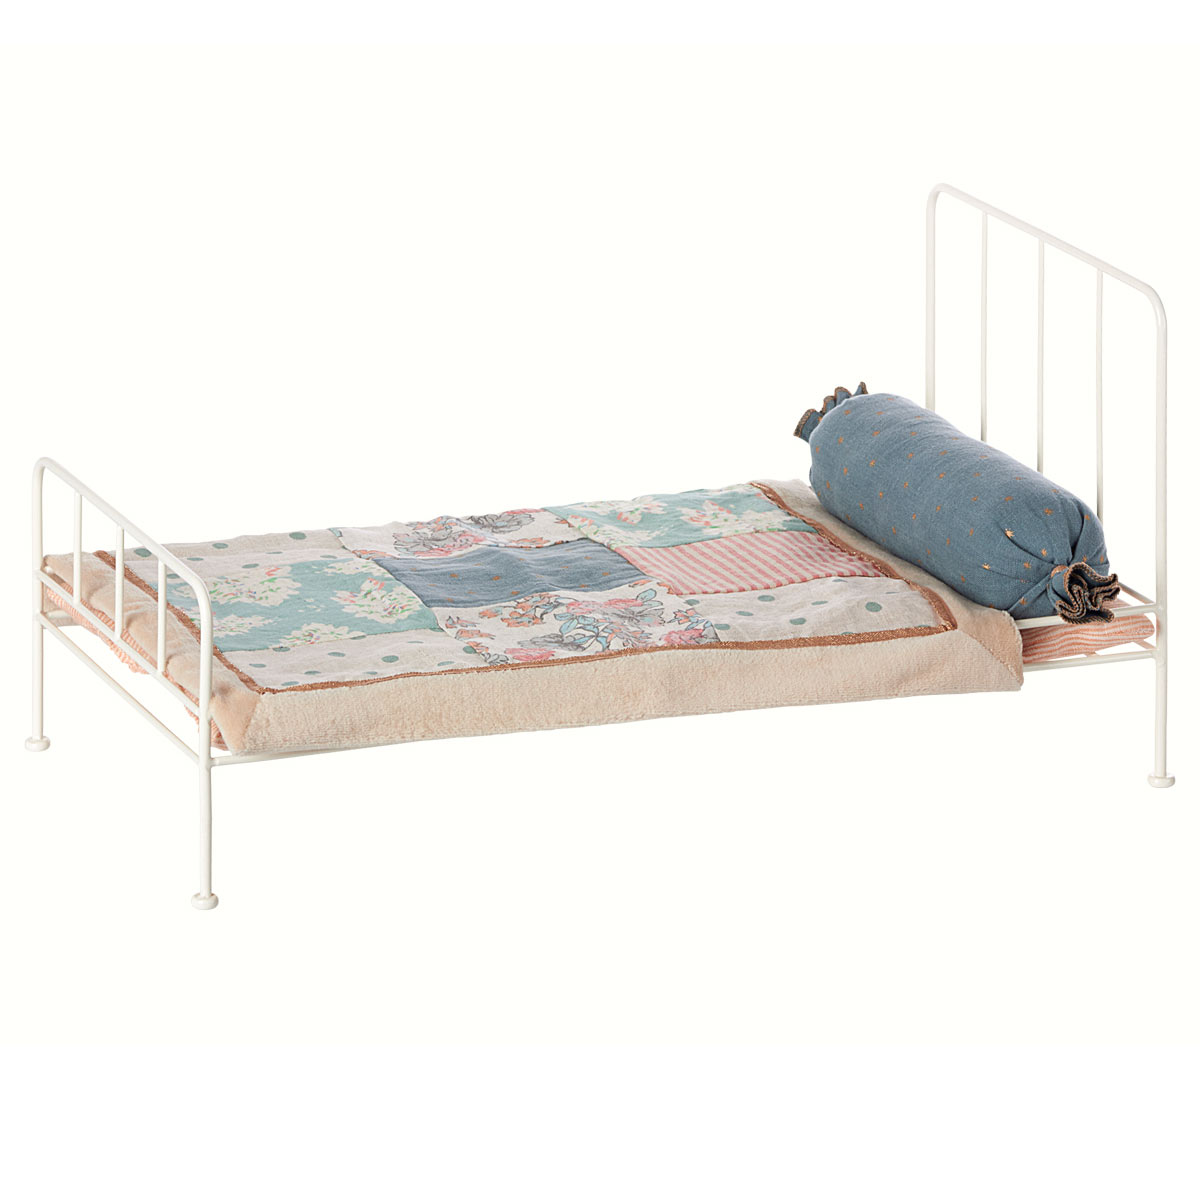 Full Size of Metall Bett Maileg Puppenhausmbel Mittelgro Weiss 11 3203 01 Ohne Füße Niedrig Betten Berlin Regale Mit Bettkasten 160x200 Himmel Halbhohes Günstiges Bett Metall Bett